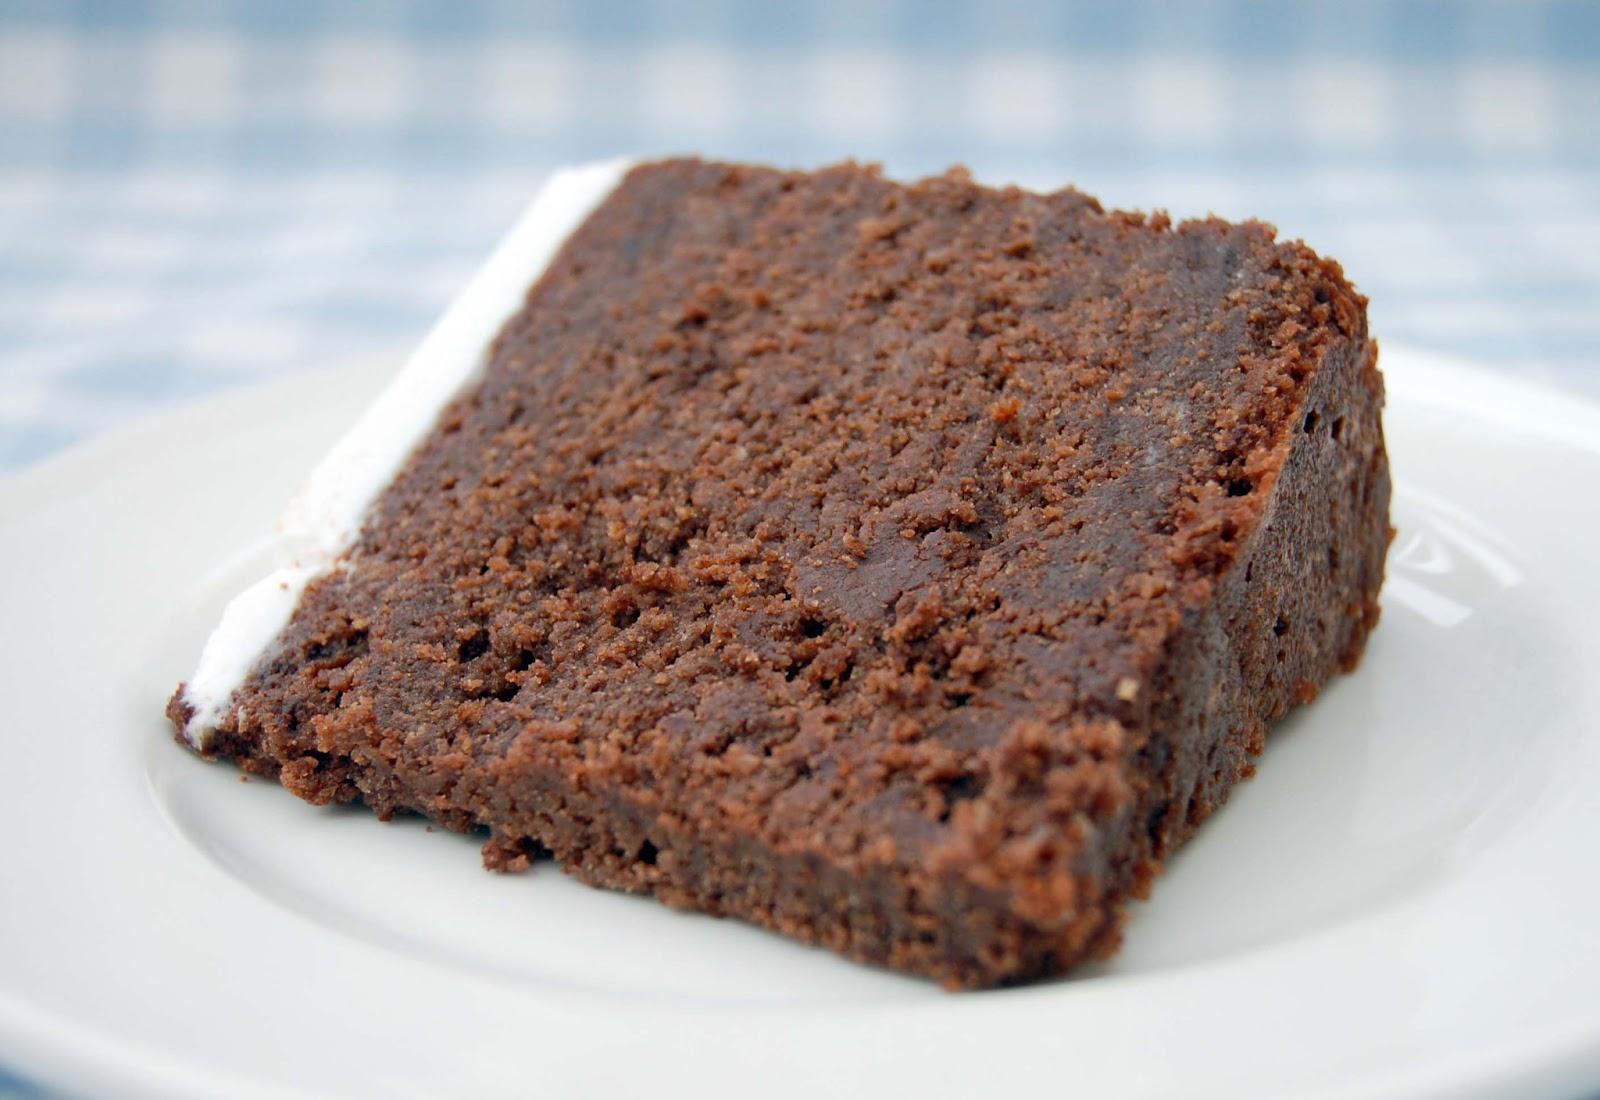 Nice Chocolate Cake Images : Intense Chocolate Wedding Cake Lisa s Nice Buns